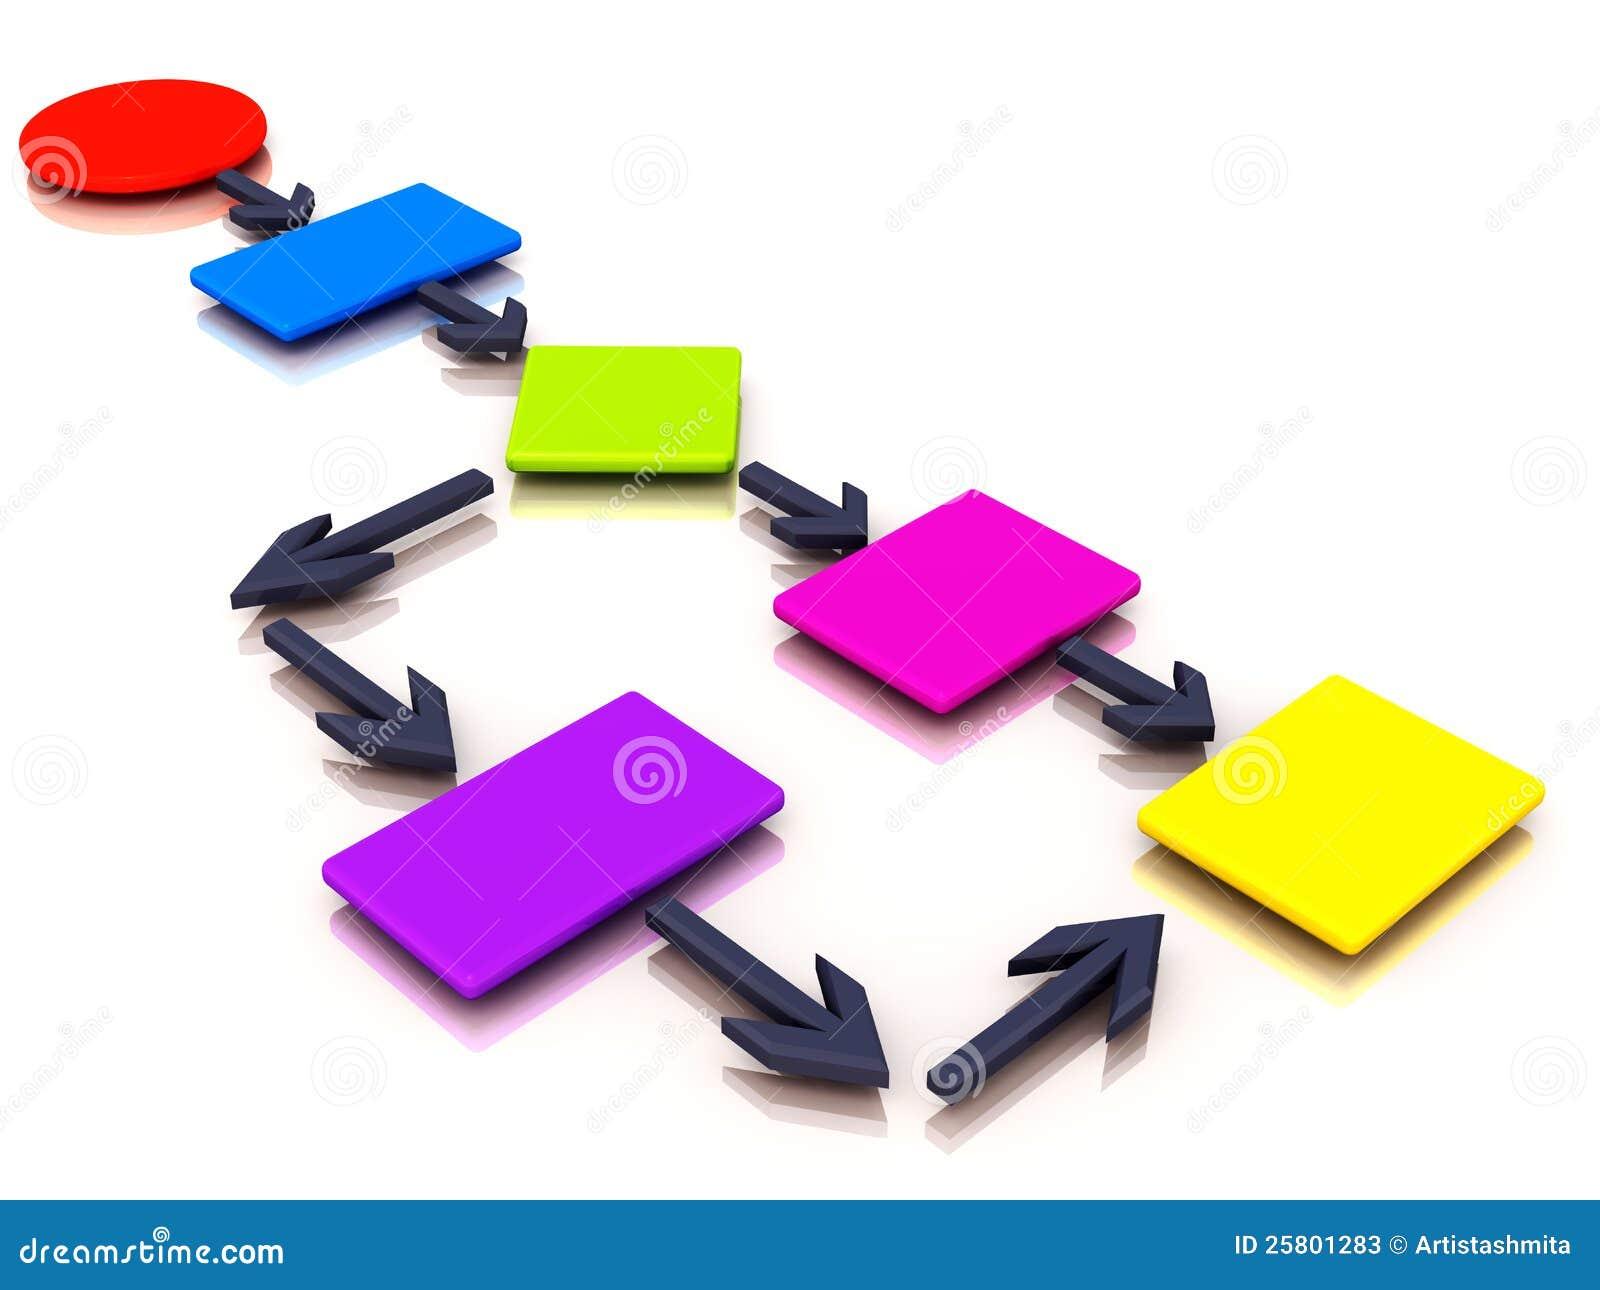 Flowchart of workflow